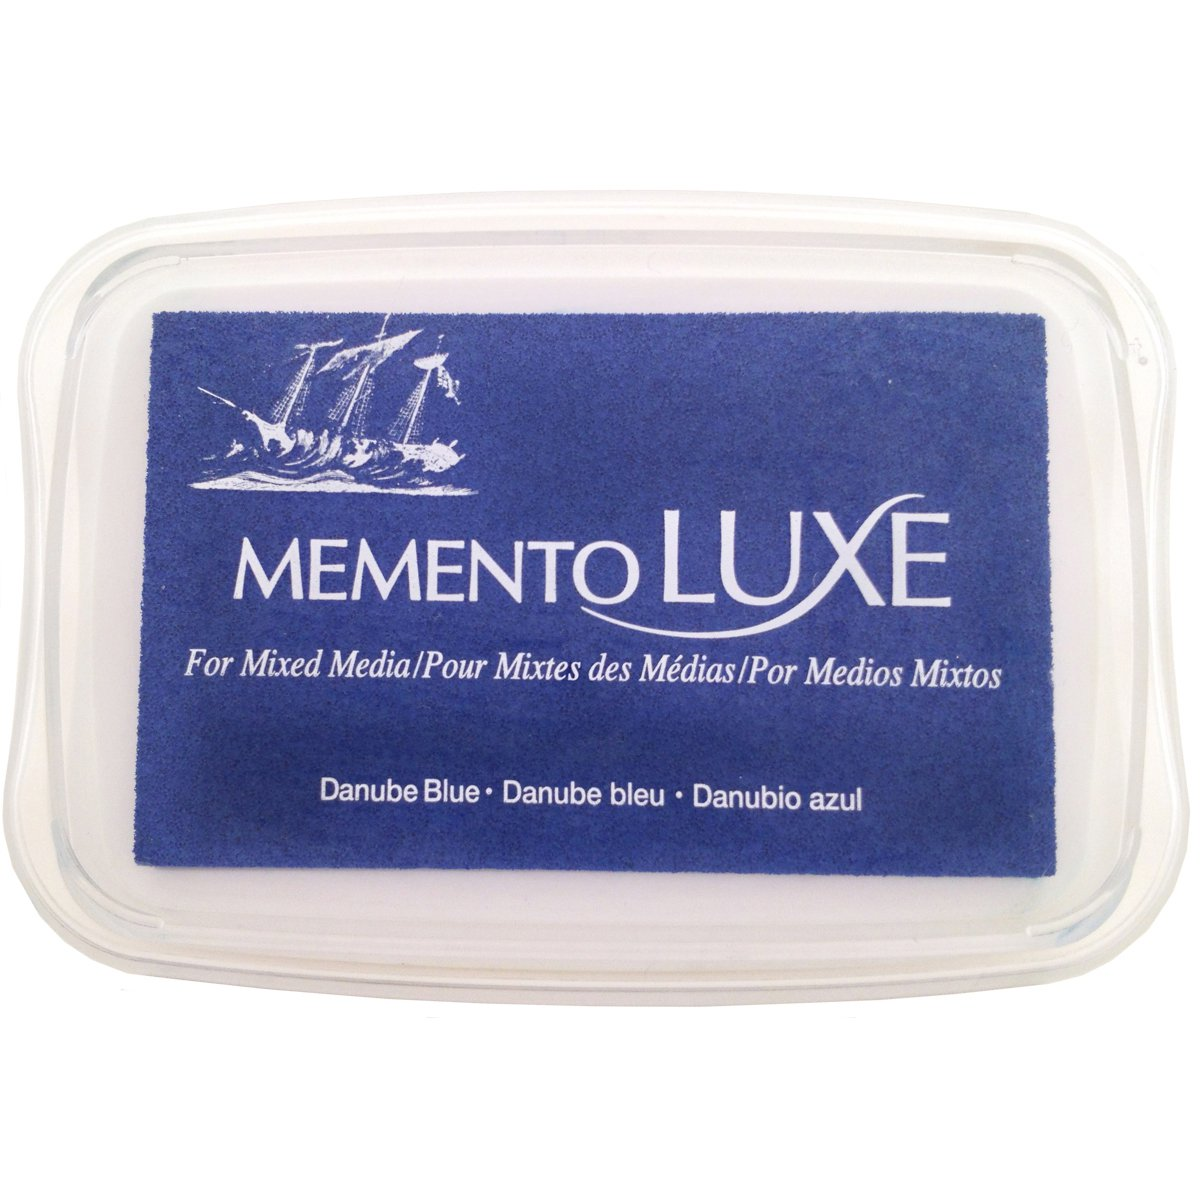 Memento Luxe Ink Pad-Danube Blue - image 1 de 1